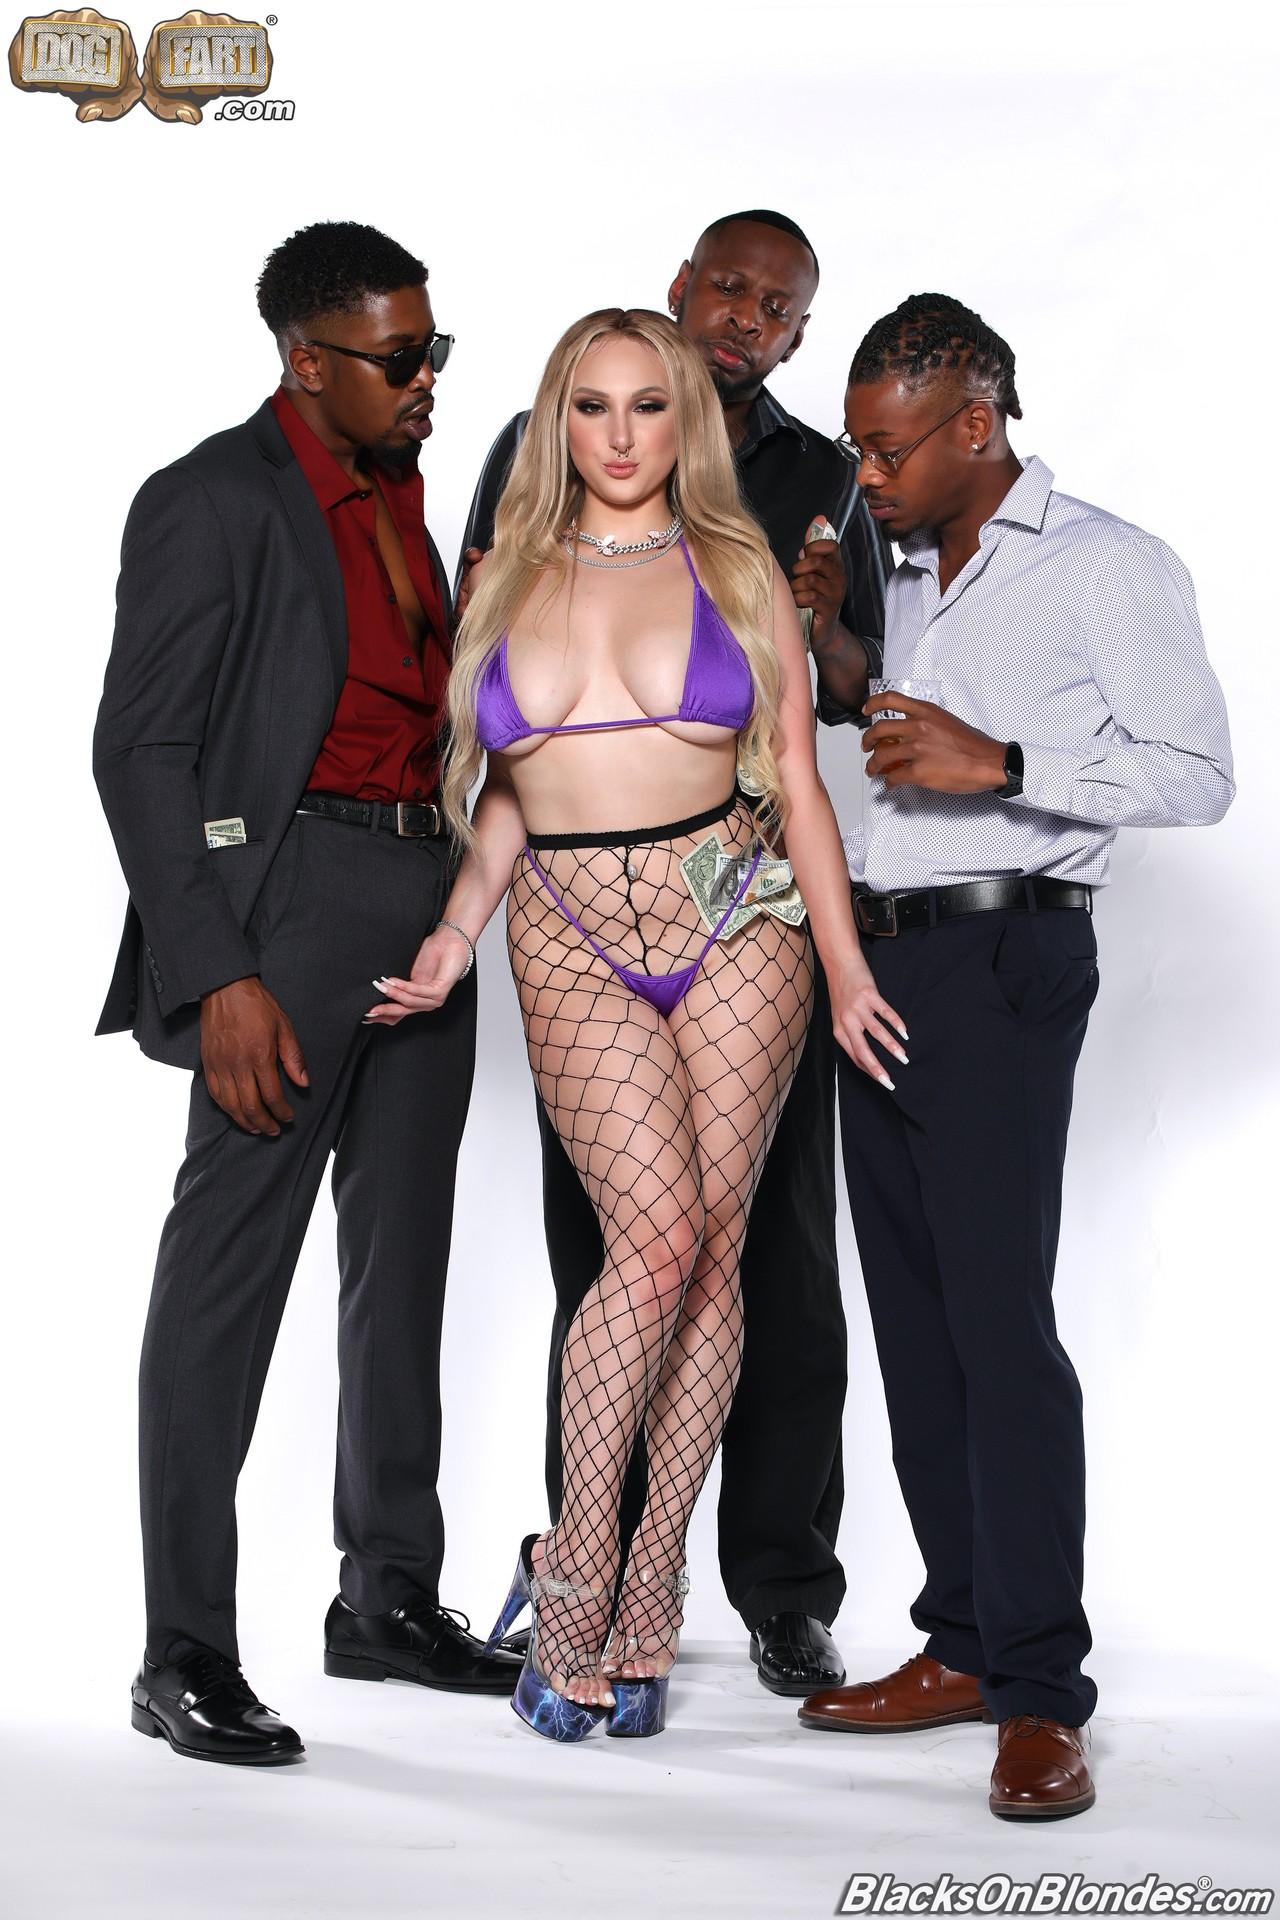 Skylar Vox Blacks On Blondes 01